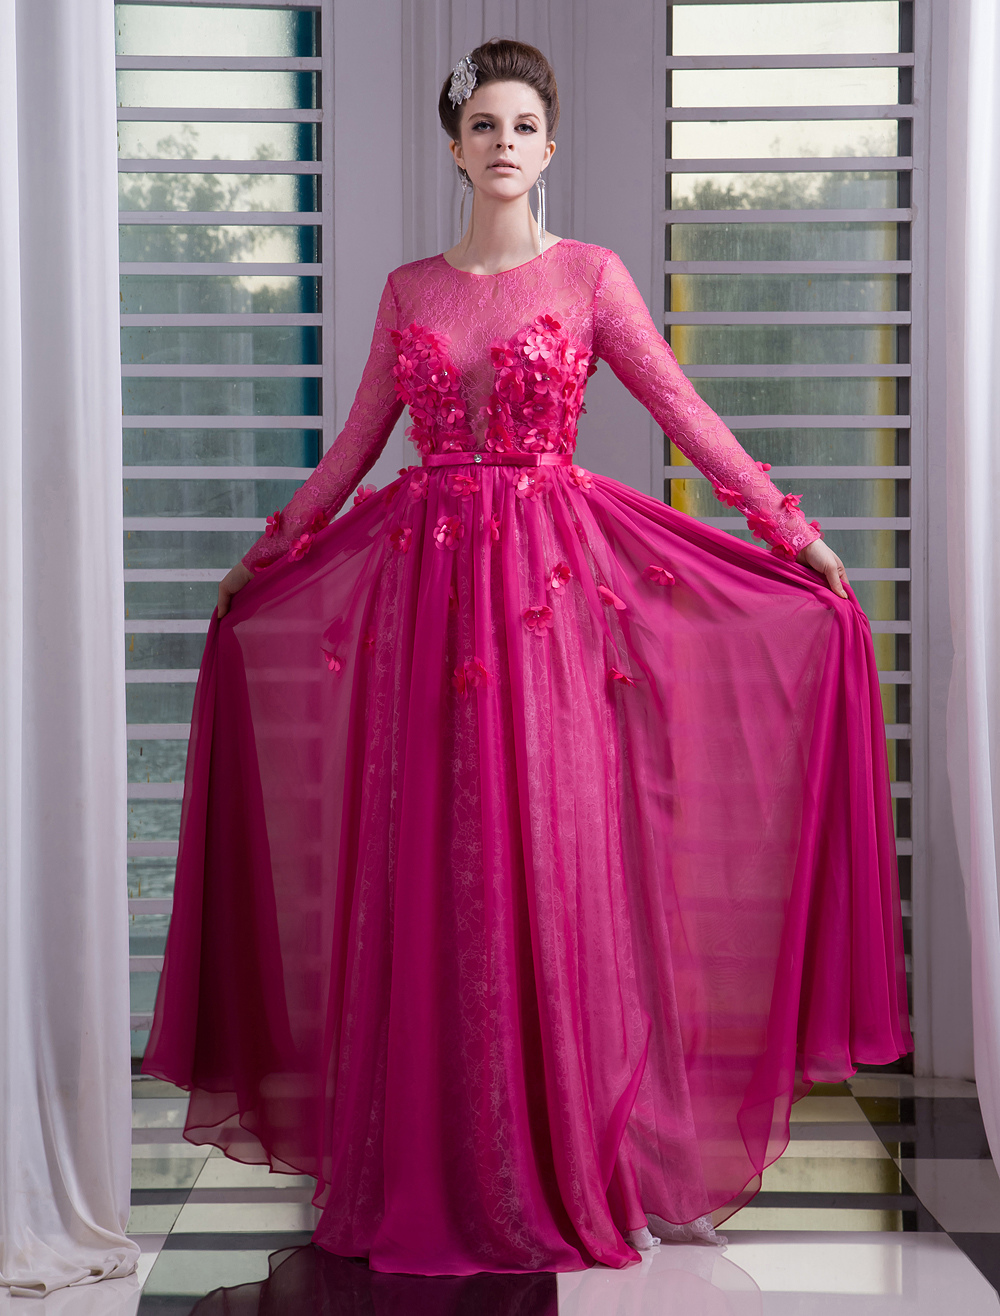 Chiffon Evening Dress Illusion 3D Flower Beaded Prom Dress Hot Pink Jewel Neck Long Sleeves A Line Floor Length Party Dress Milanoo